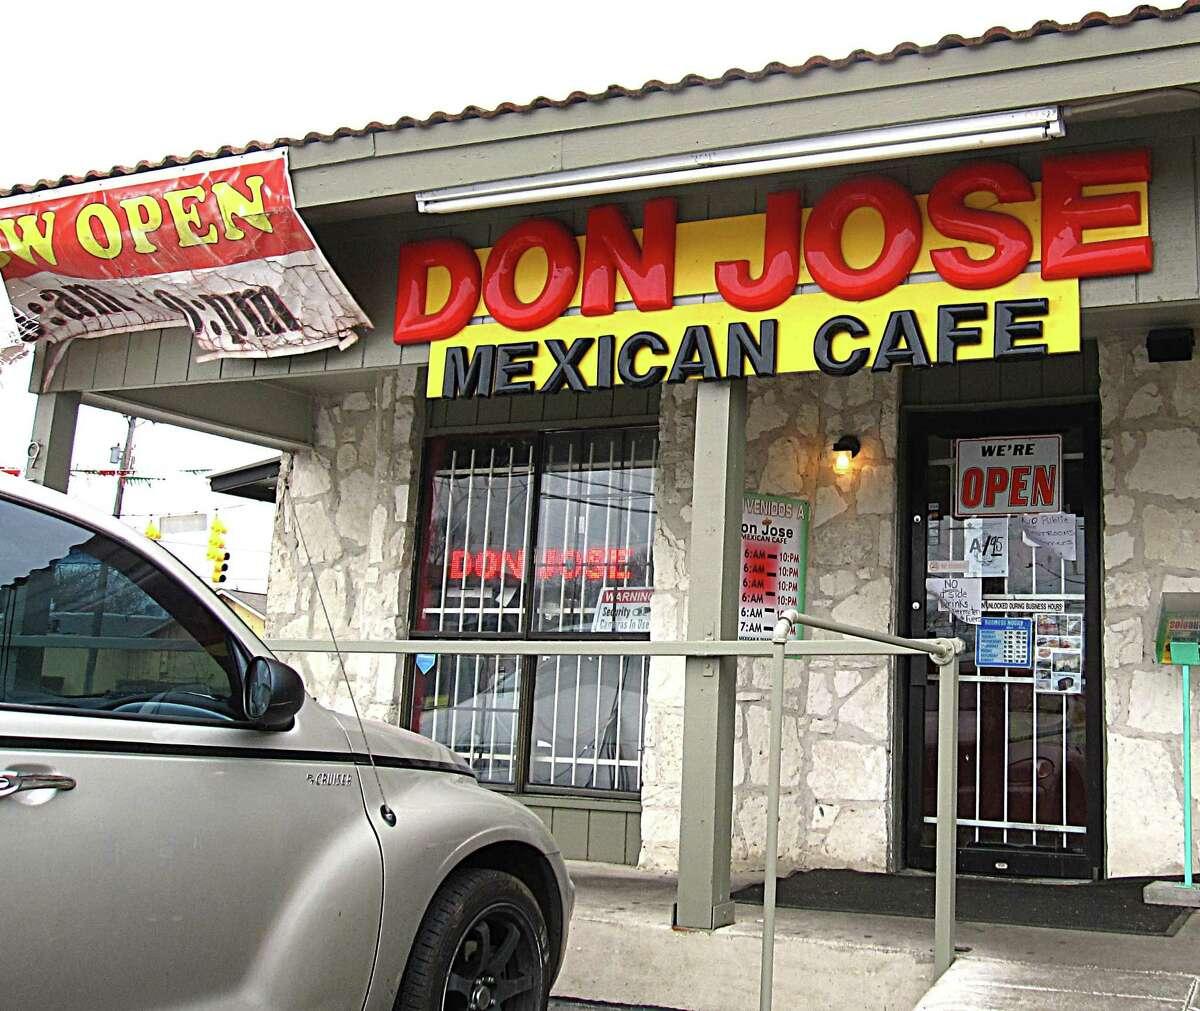 Don Jose Mexican Cafe on Pleasanton Road.